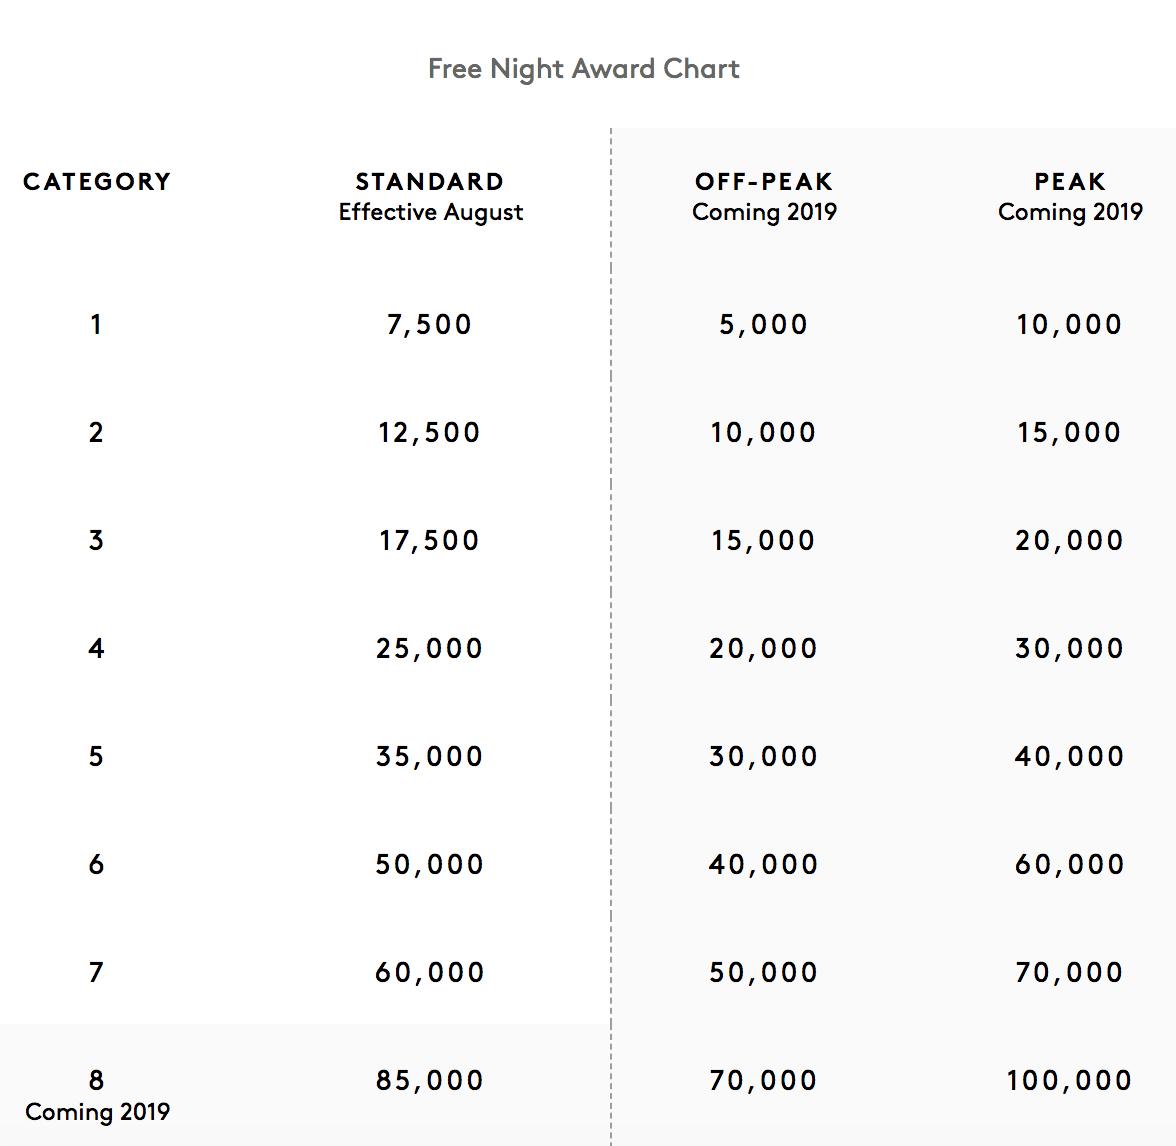 Marriott Award Rates